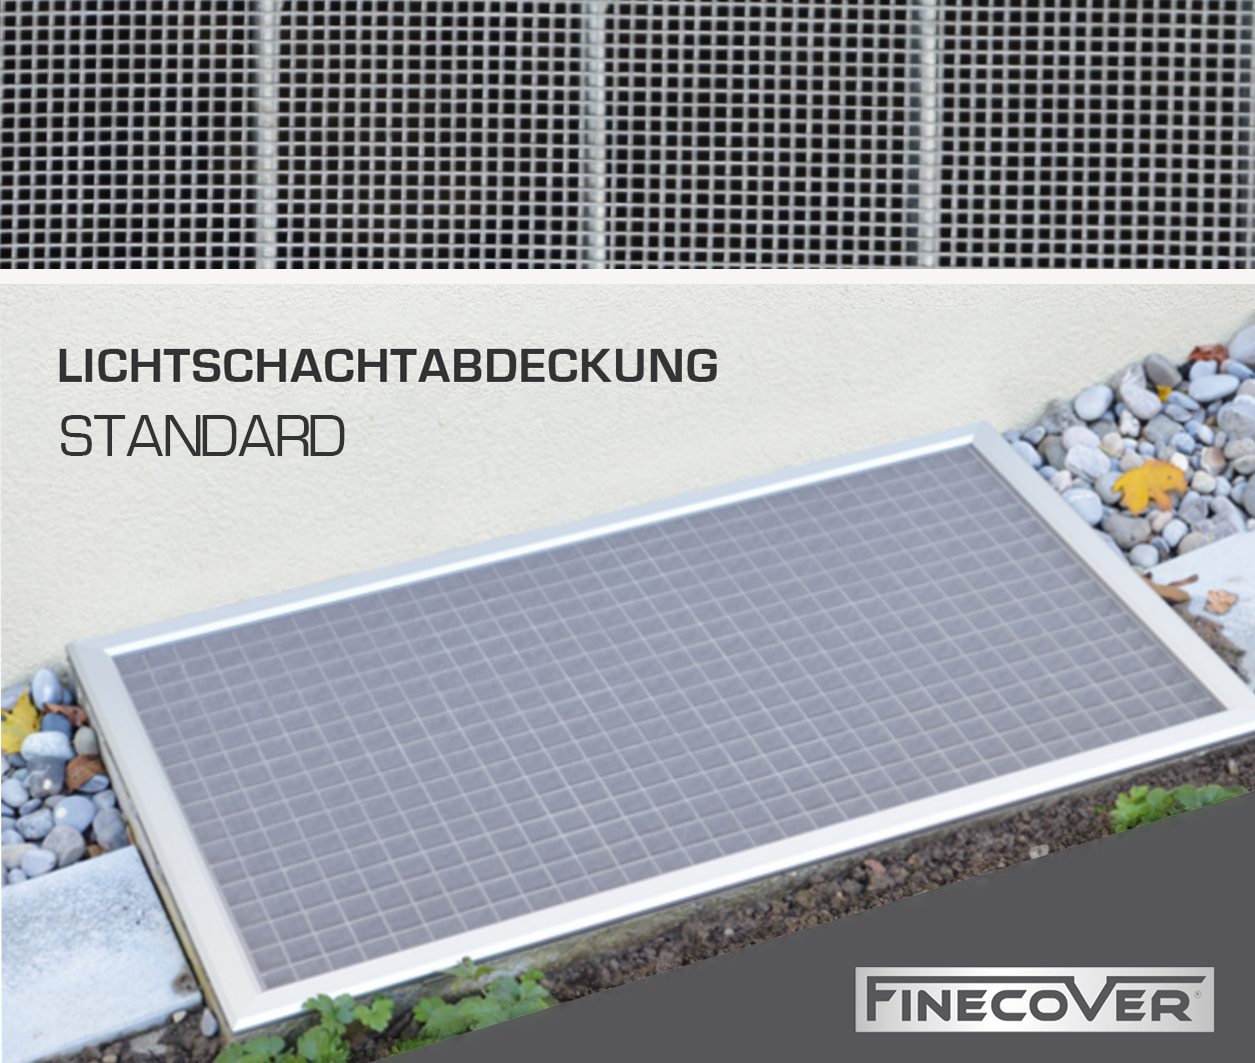 lichtschachtabdeckungen insektenschutzgitter mass norm gitterroste. Black Bedroom Furniture Sets. Home Design Ideas